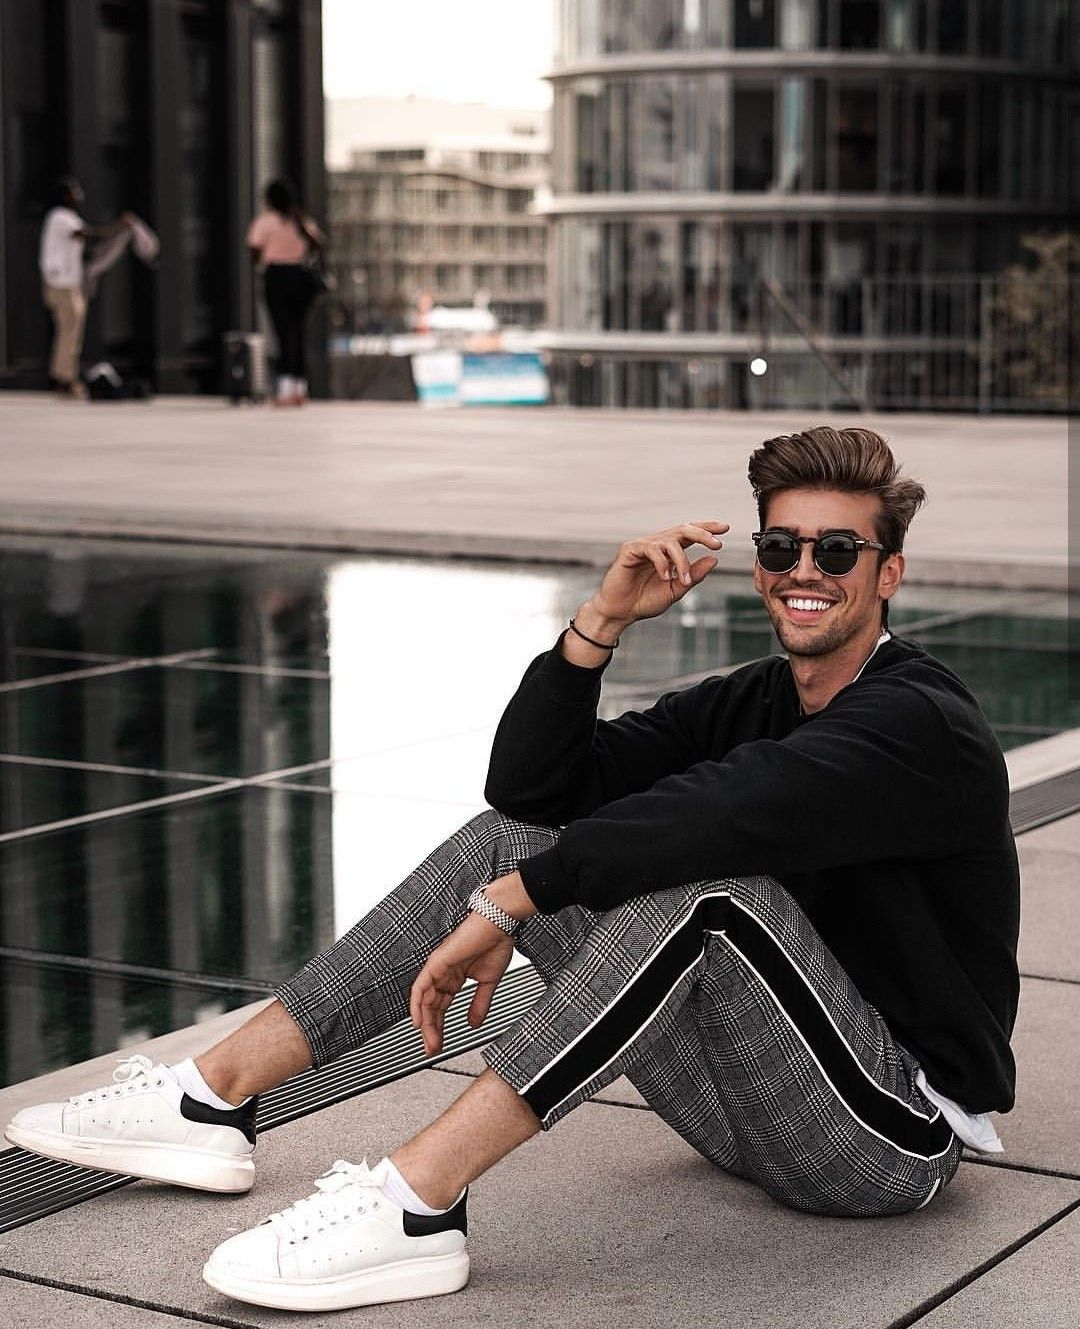 #Mens #Casual #Style #Stylish #Fashion #CasualWear